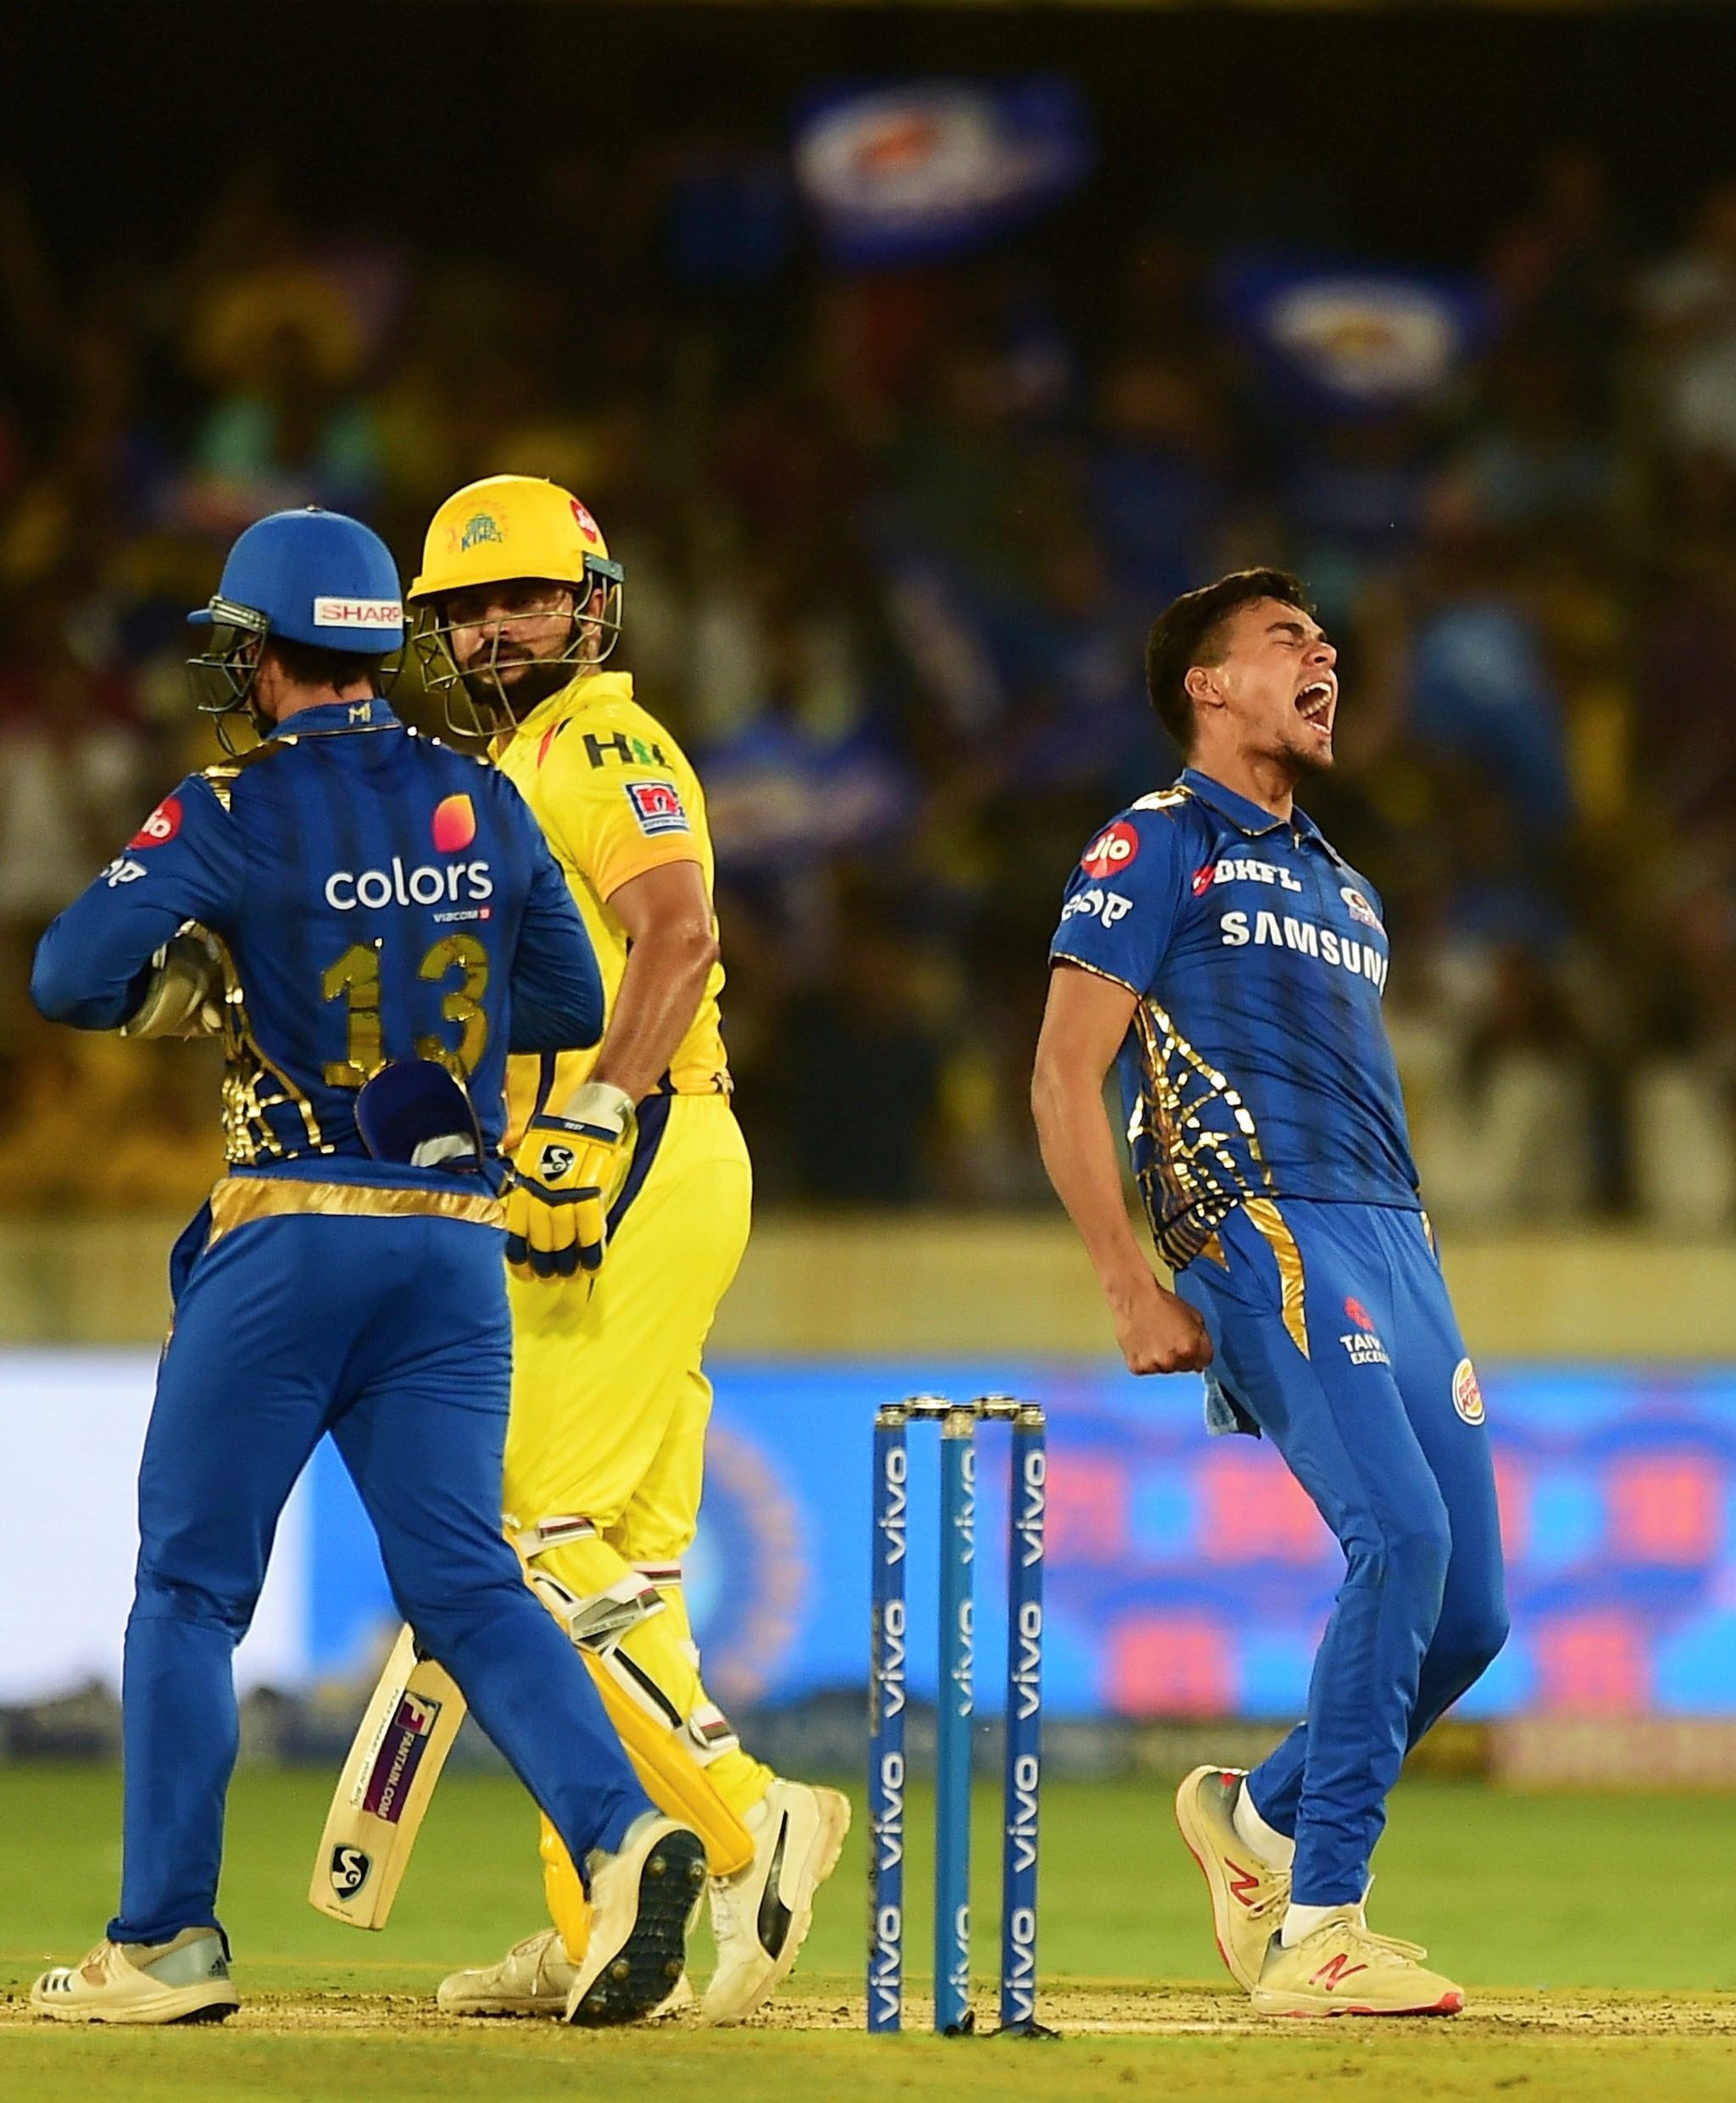 MI bowler Rahul Chahar celebrates the wicket of Chennai Super Kings (CSK) player Suresh Raina | PTI